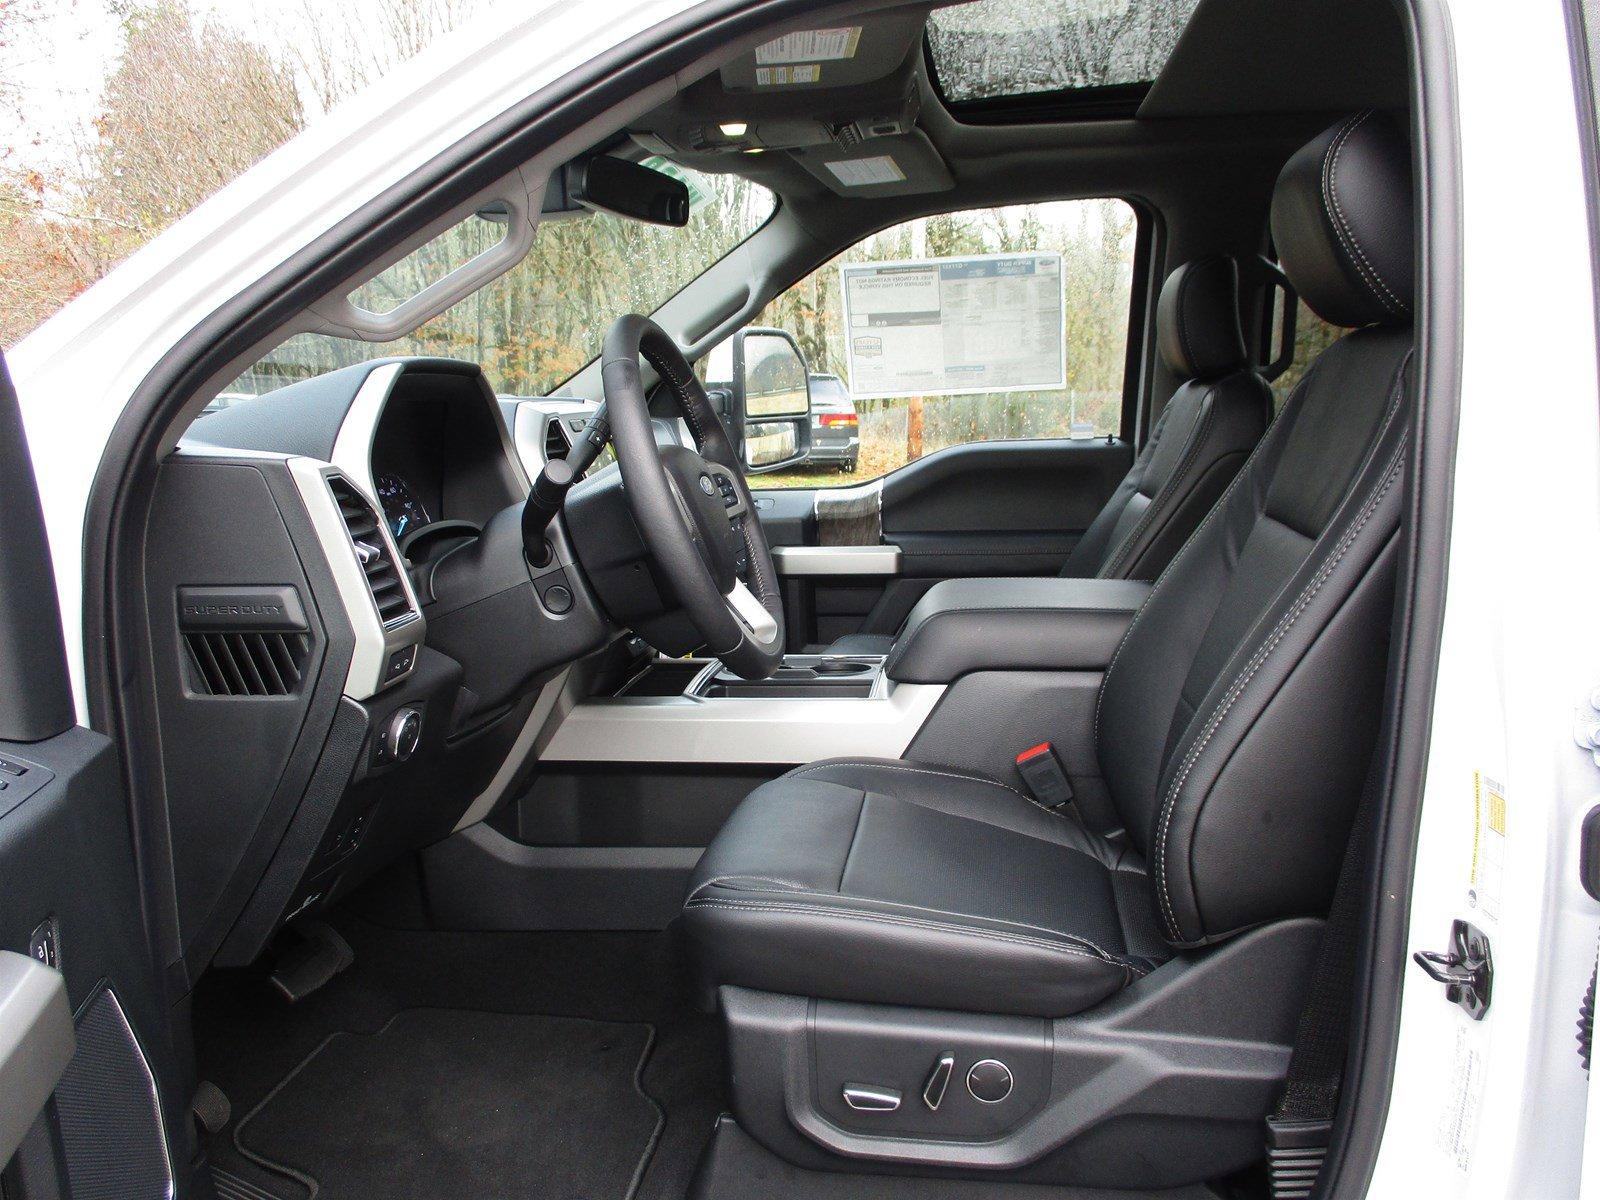 New 2019 Ford Super Duty F-350 DRW LARIAT 4WD Crew Cab 8' Box